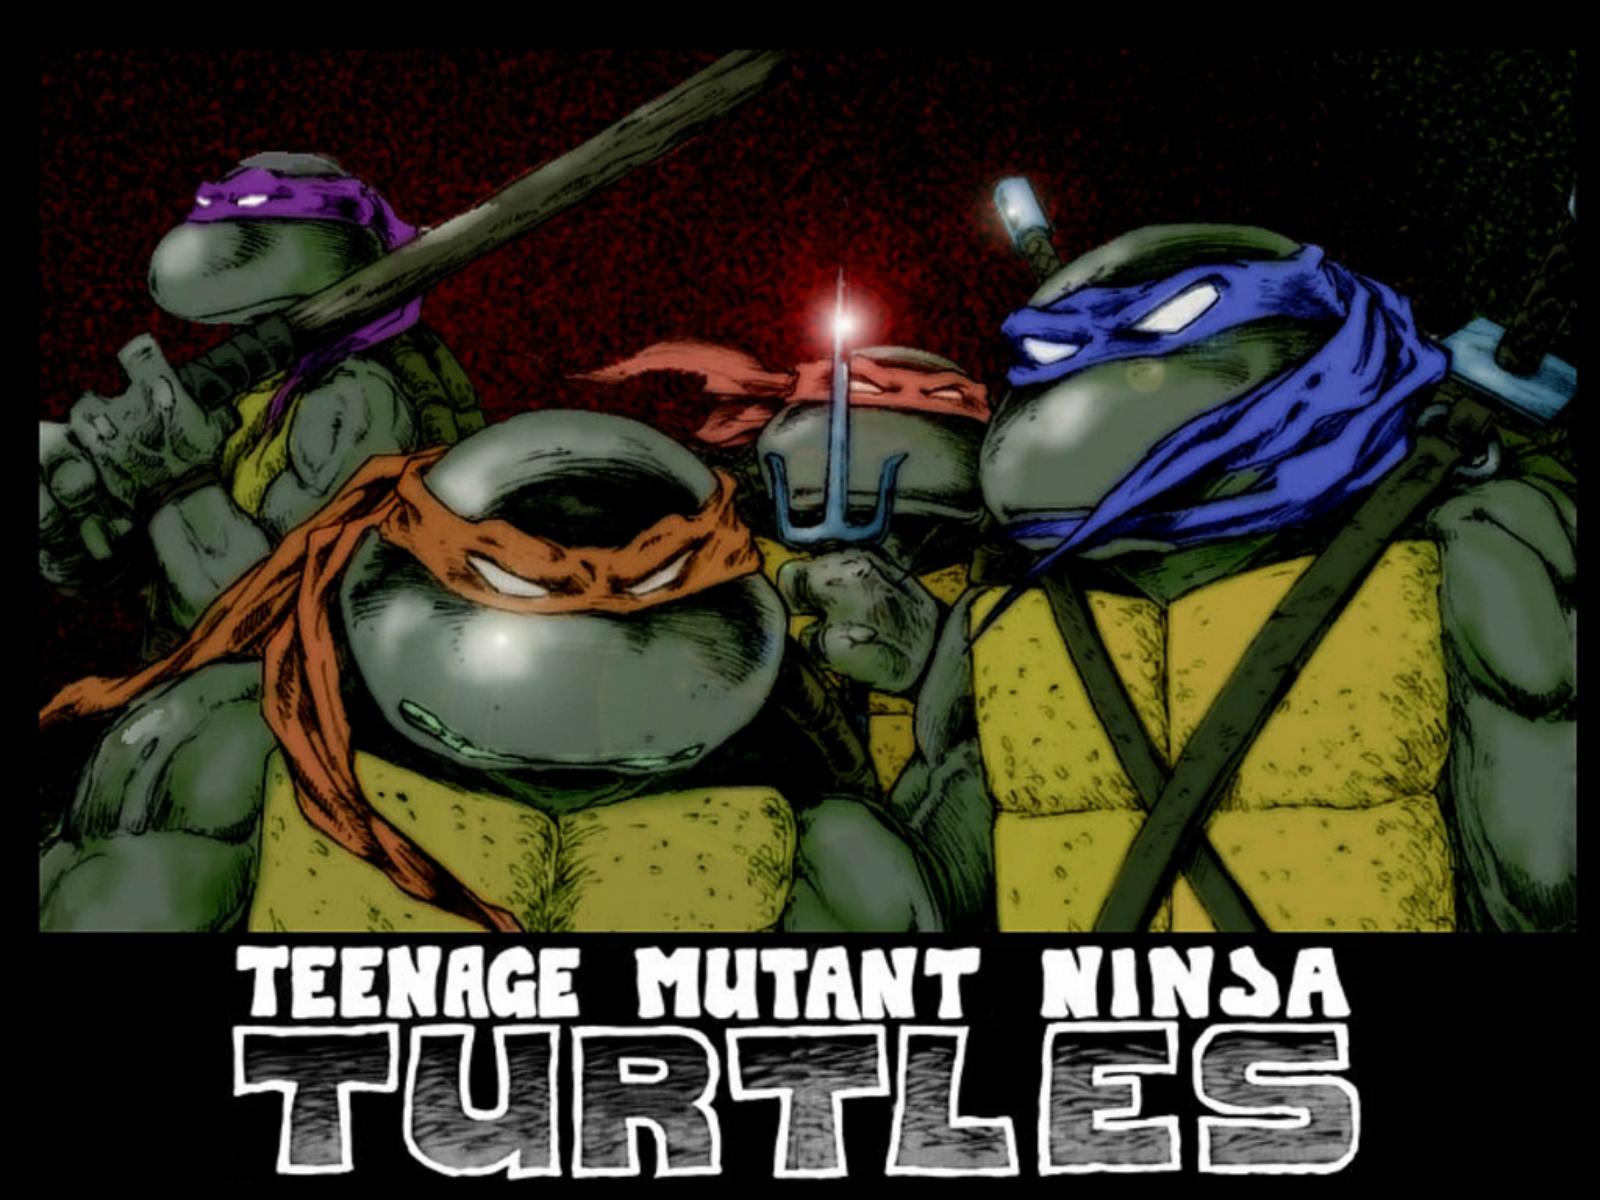 http://3.bp.blogspot.com/-456vA2-8xik/Tkr1kKq2KxI/AAAAAAAAAmY/_Y6t3l0ygT0/s1600/vvallpaper.net_Teenage_mutant_ninja_kaplumbagalar.jpg